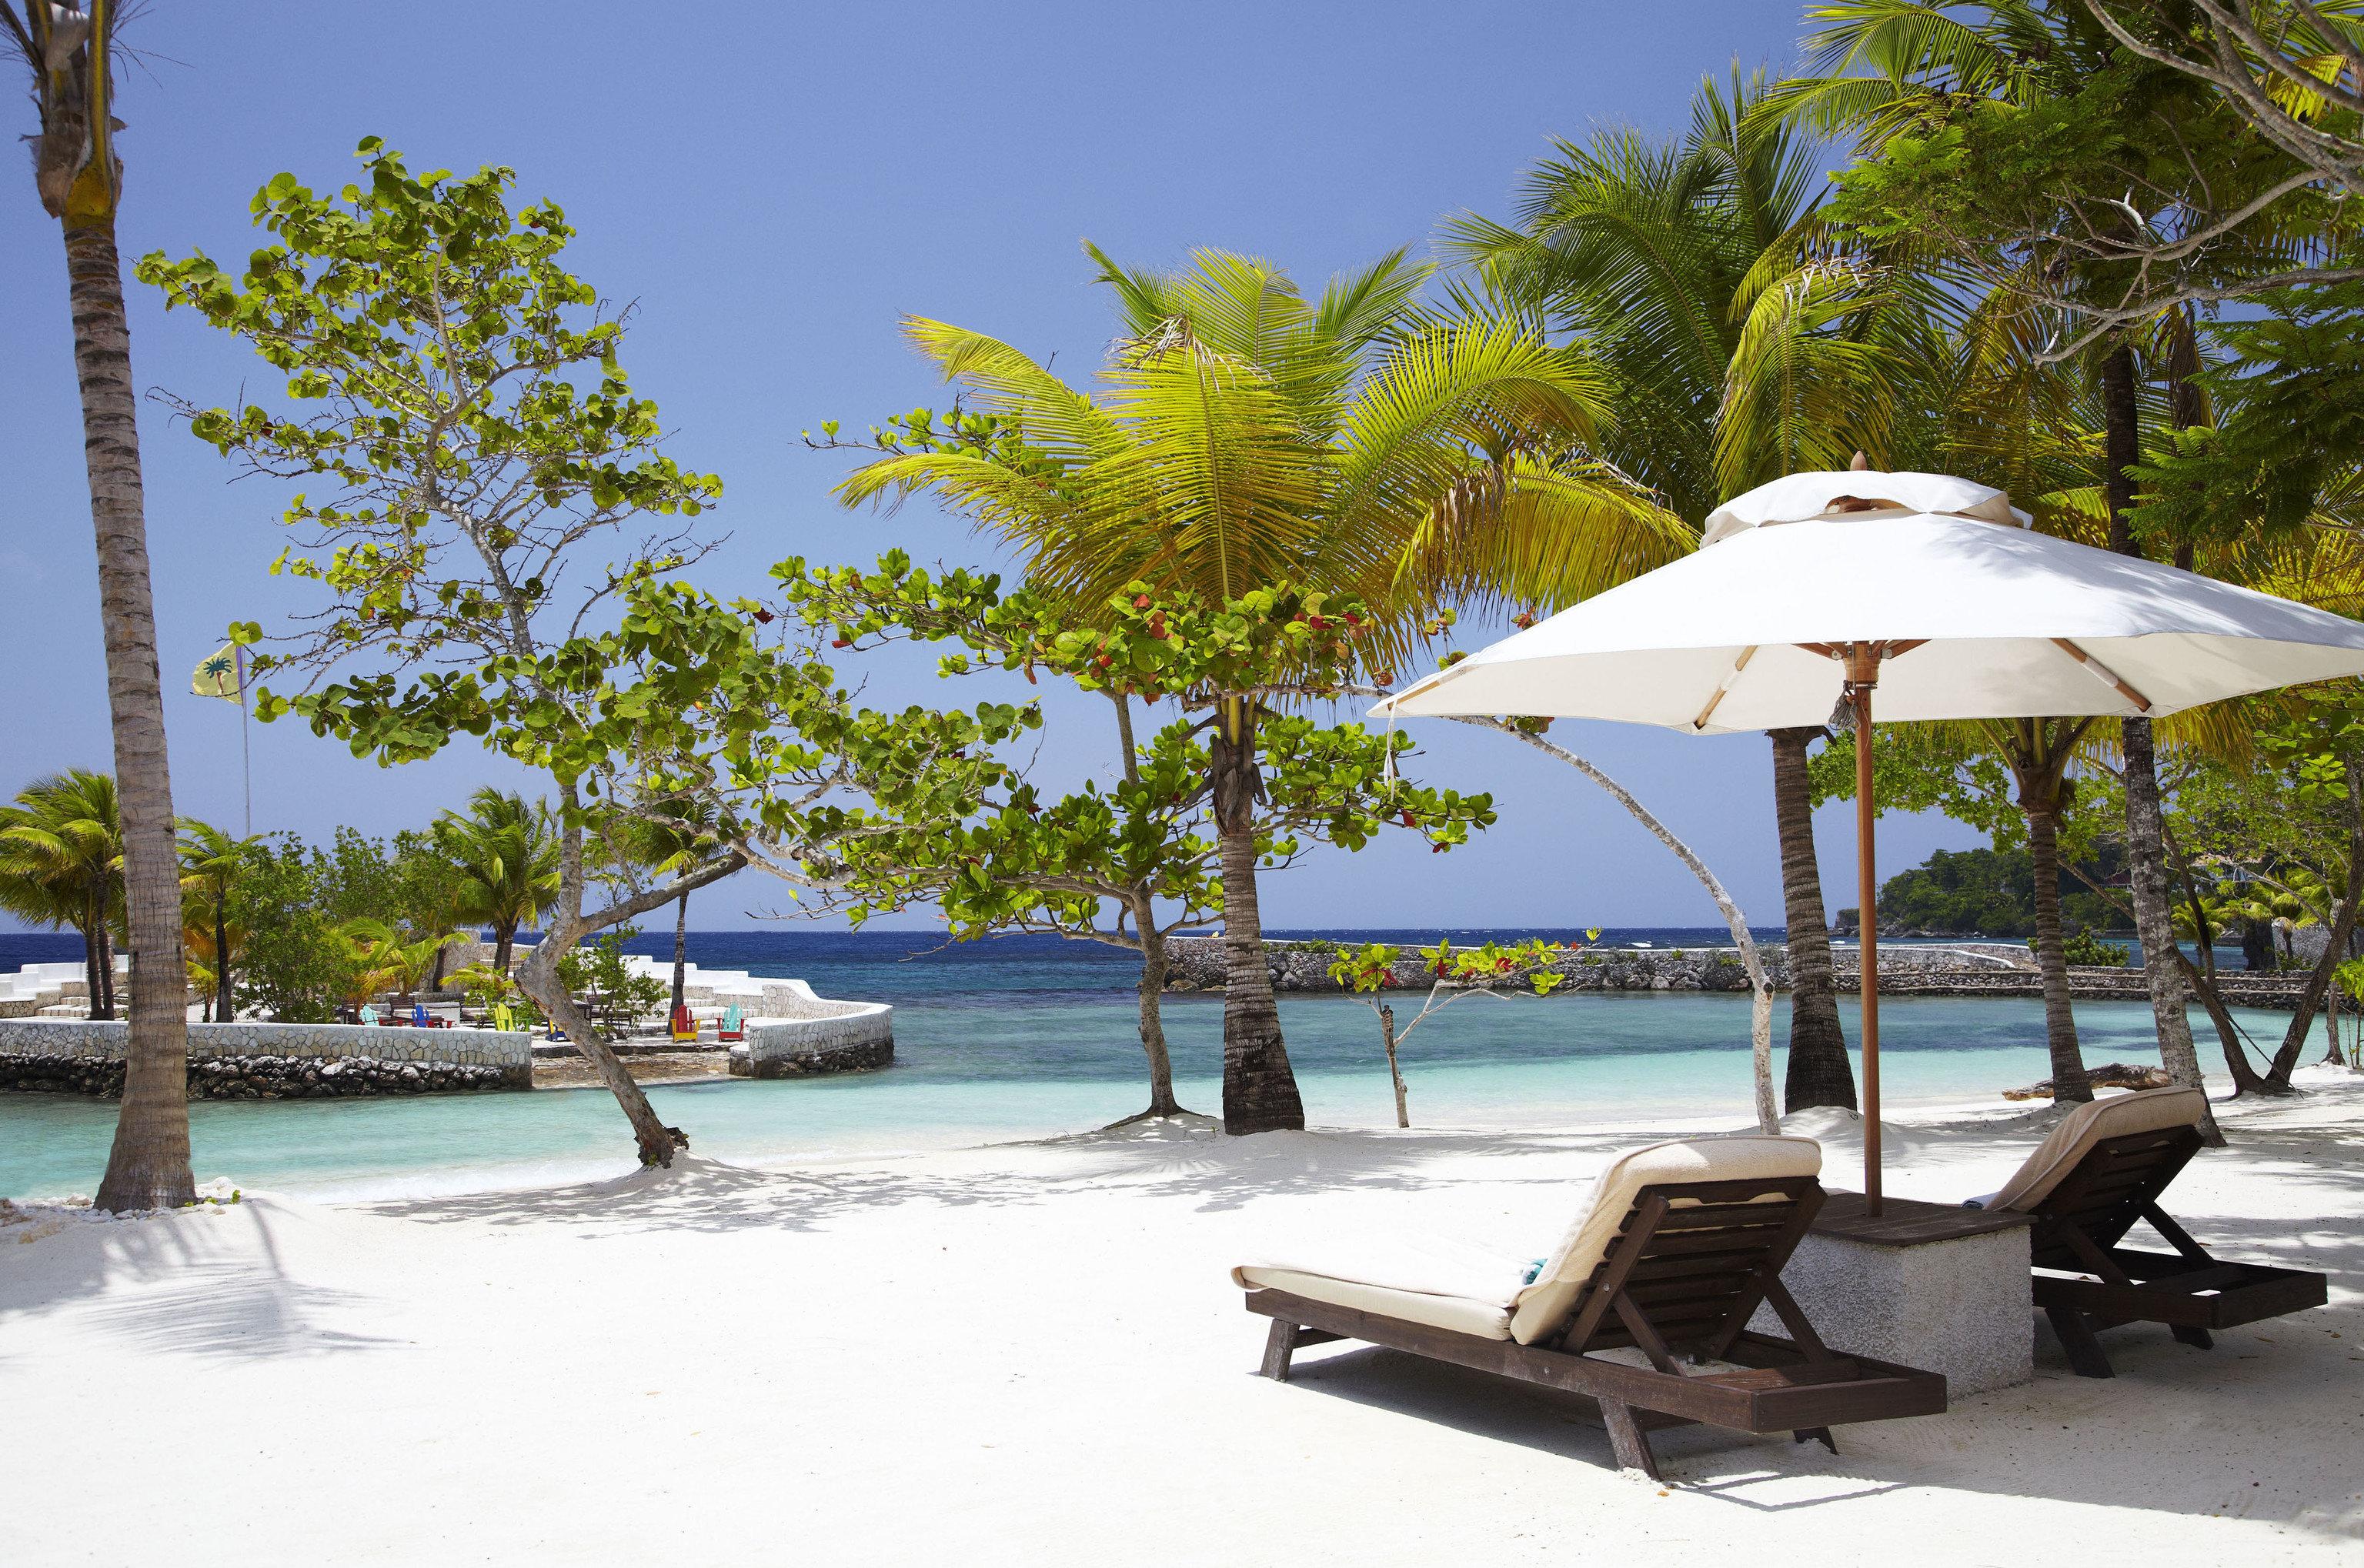 tree sky Resort tropics arecales swimming pool palm tree caribbean leisure sunlounger outdoor furniture Beach water Sea Lagoon resort town shore